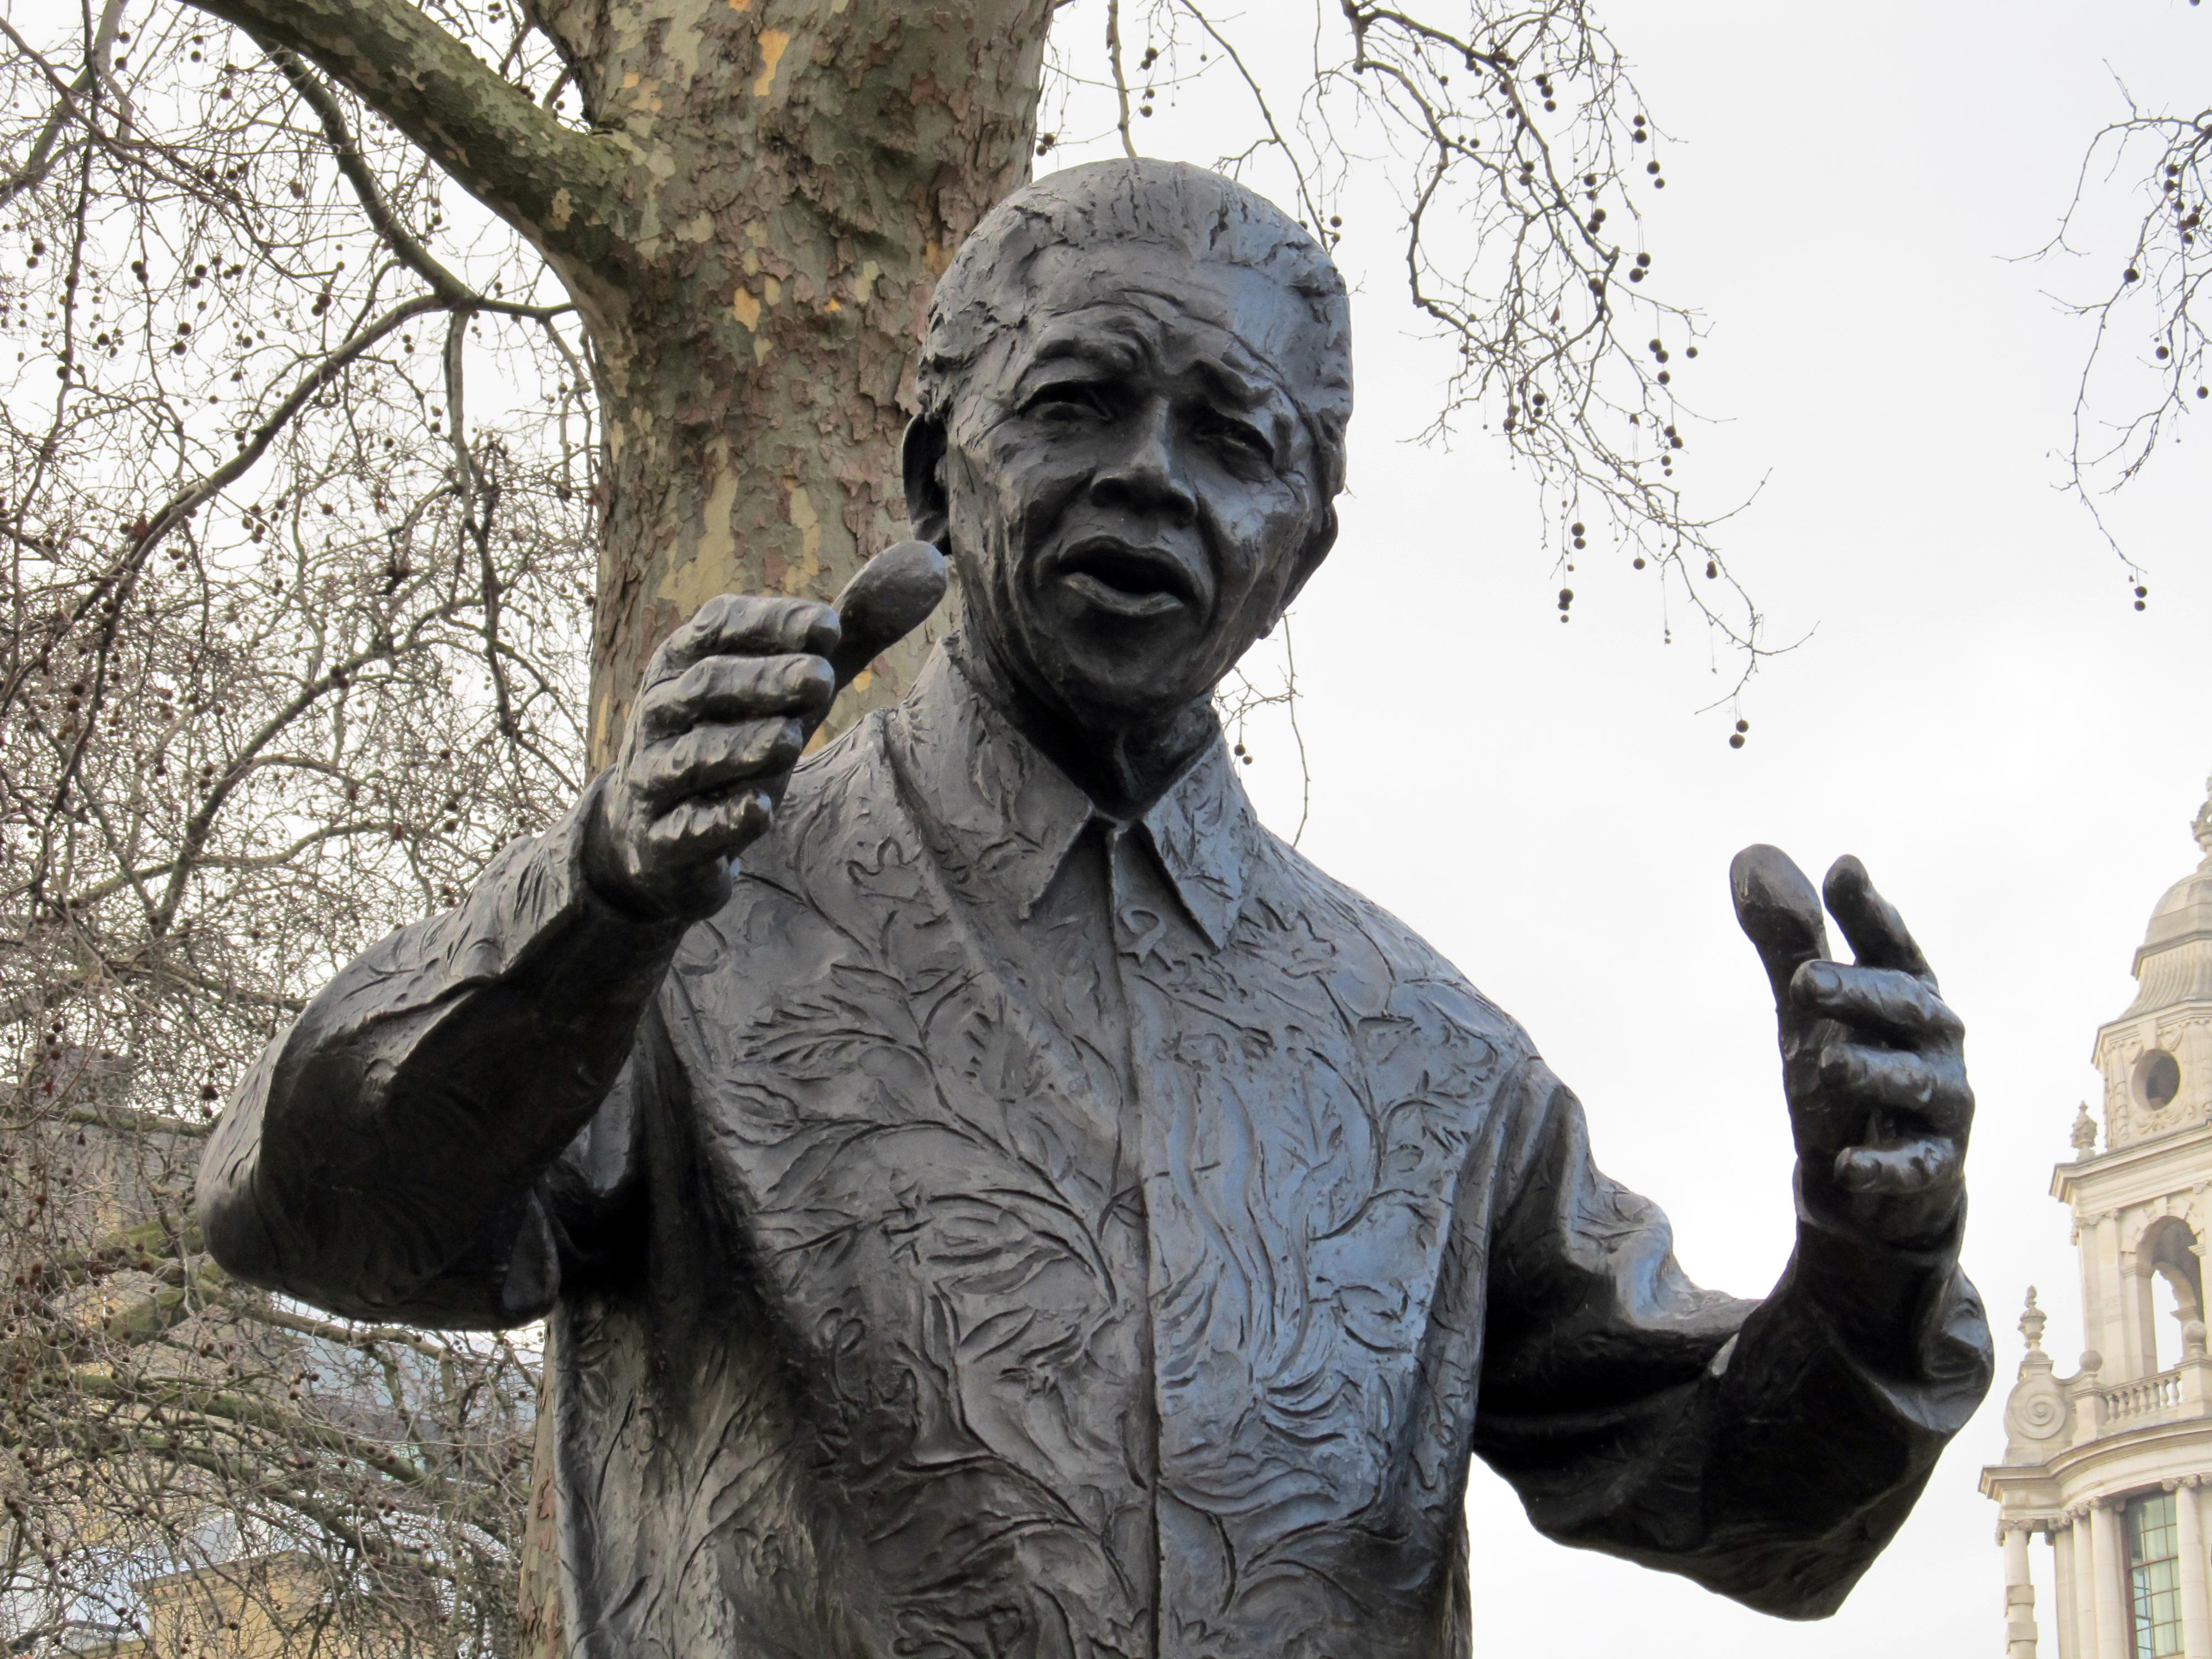 File:Nelson Mandela statue, Westminster.JPG - Wikimedia